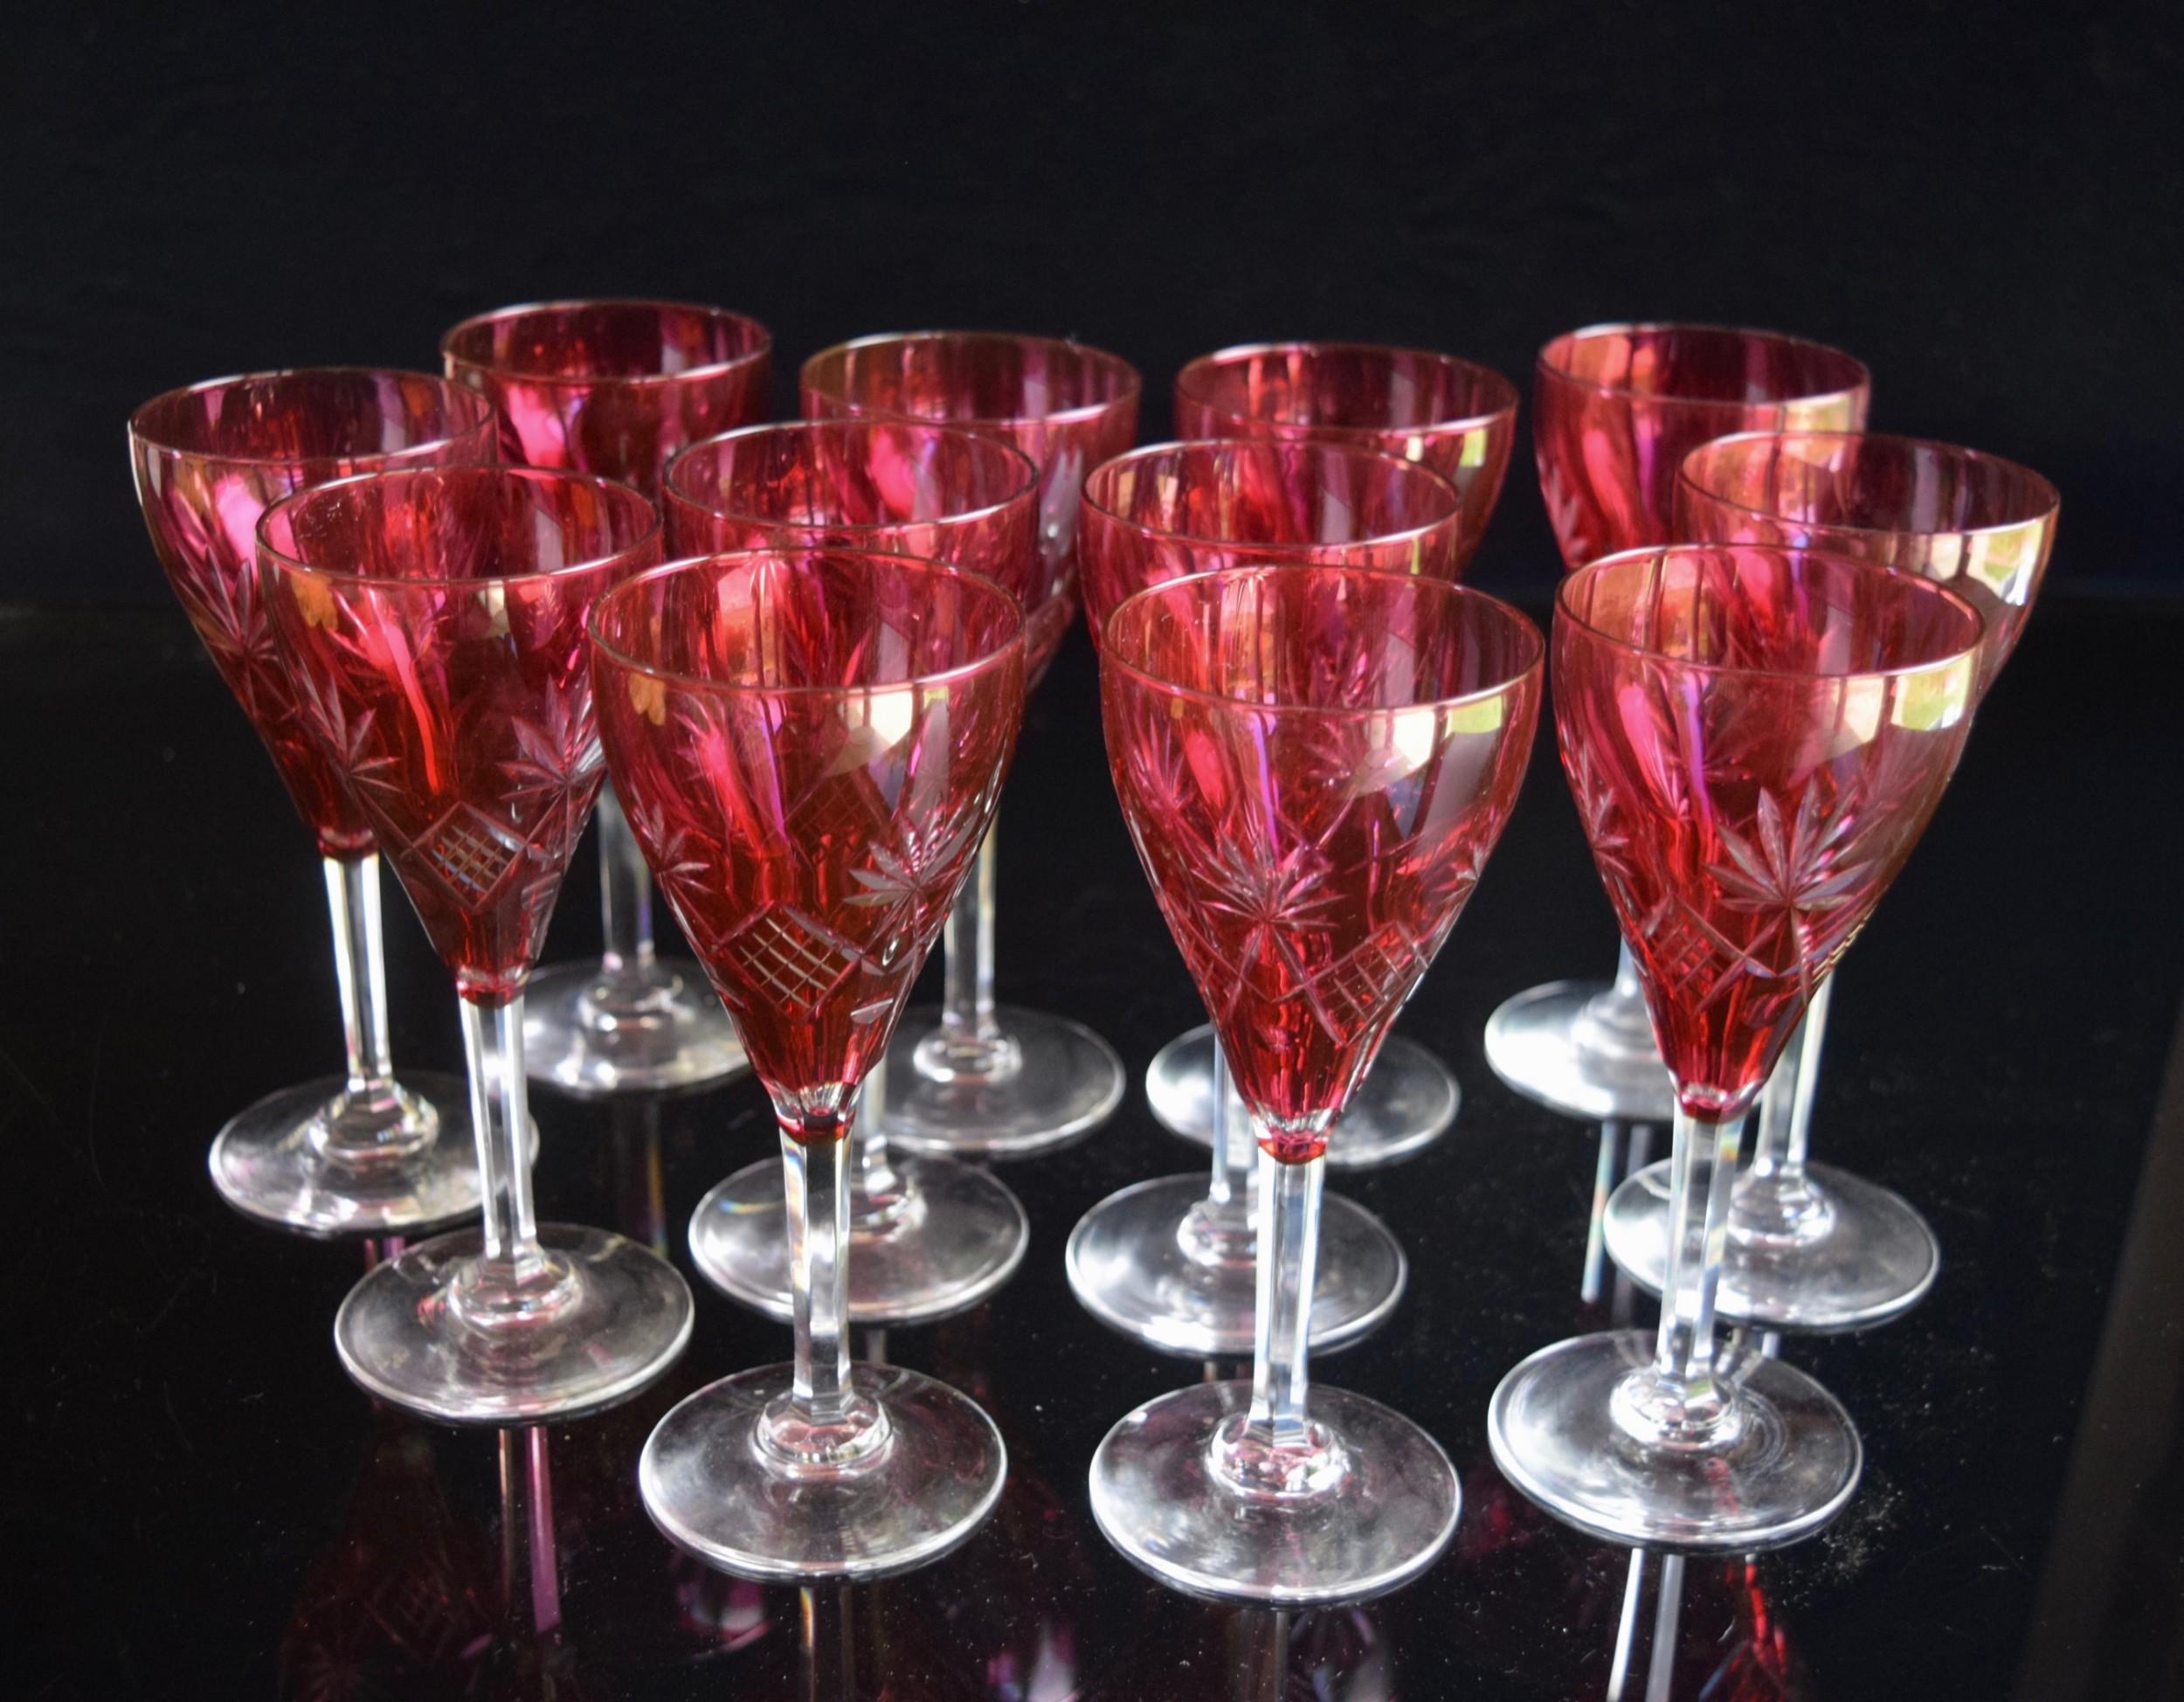 12 val saint lambert ruby coloured small wine glasses c1920s